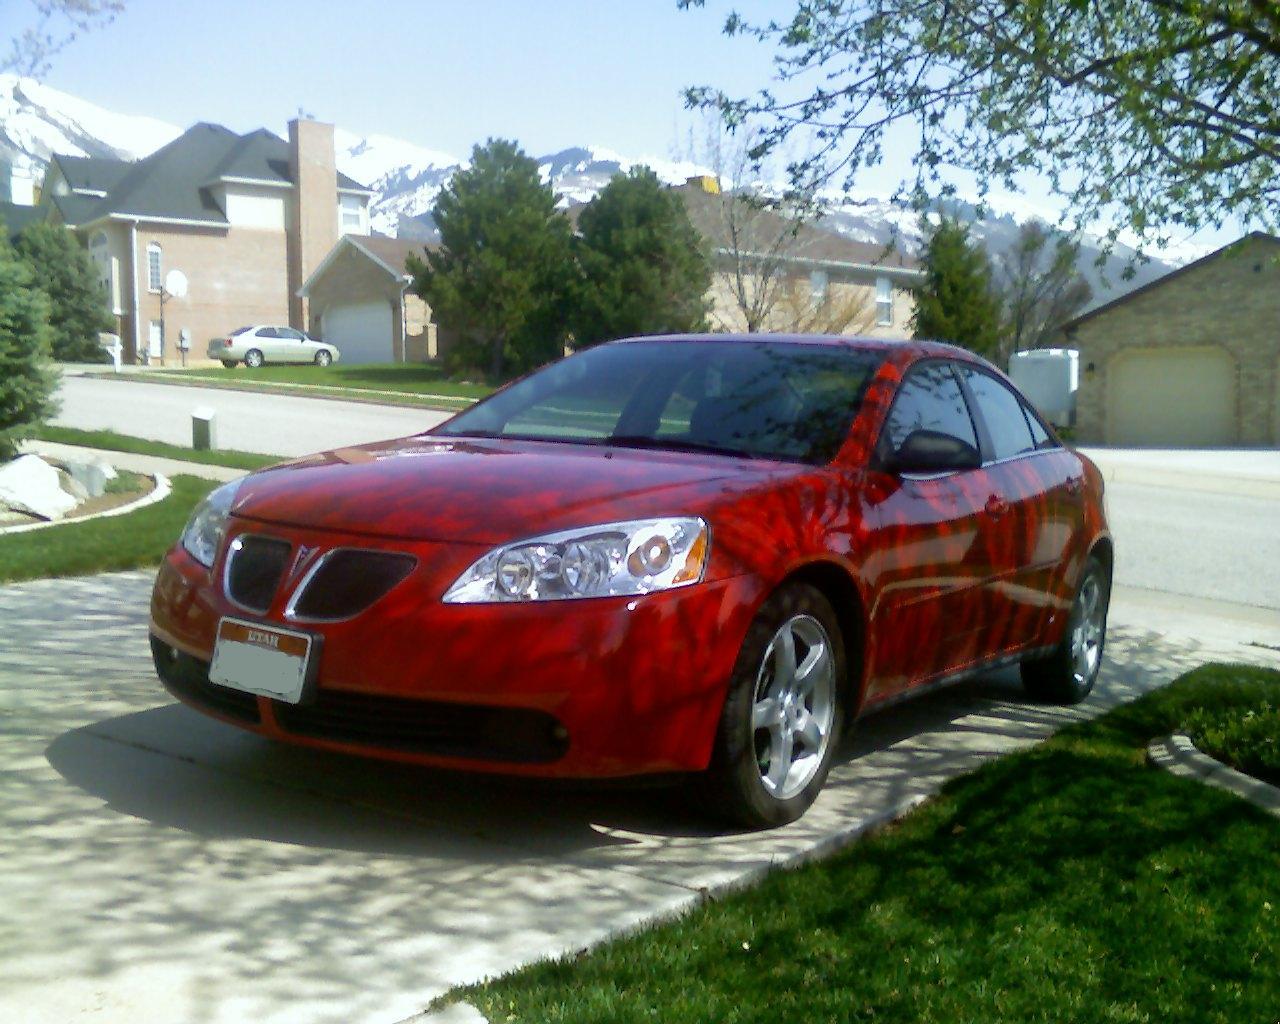 2007 Pontiac G6 - Pictures